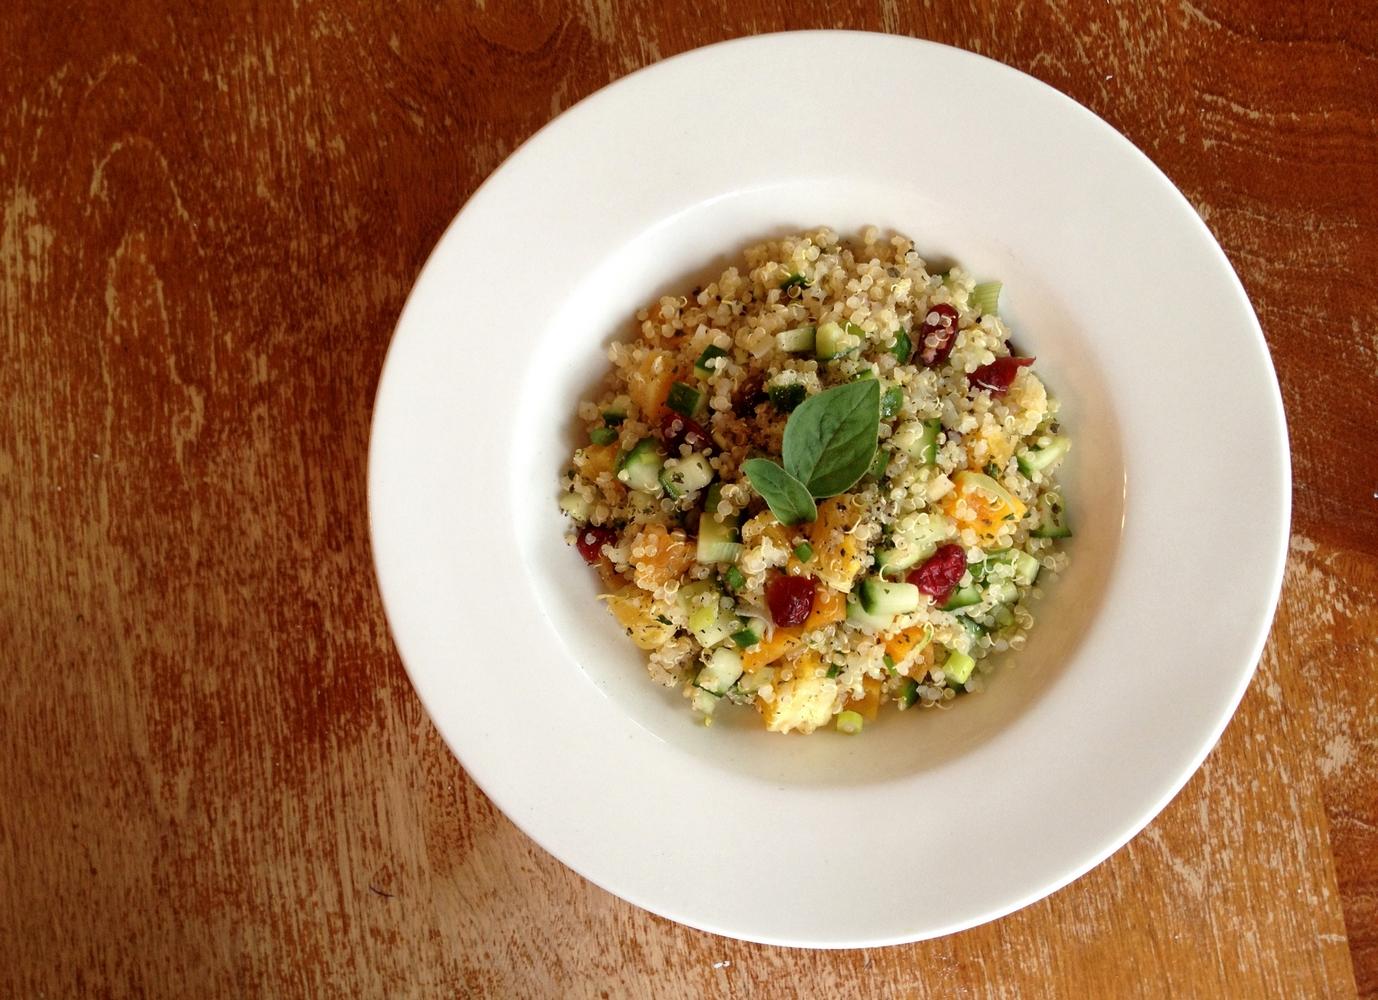 salade-quinoa-fruits-seches-agrumes